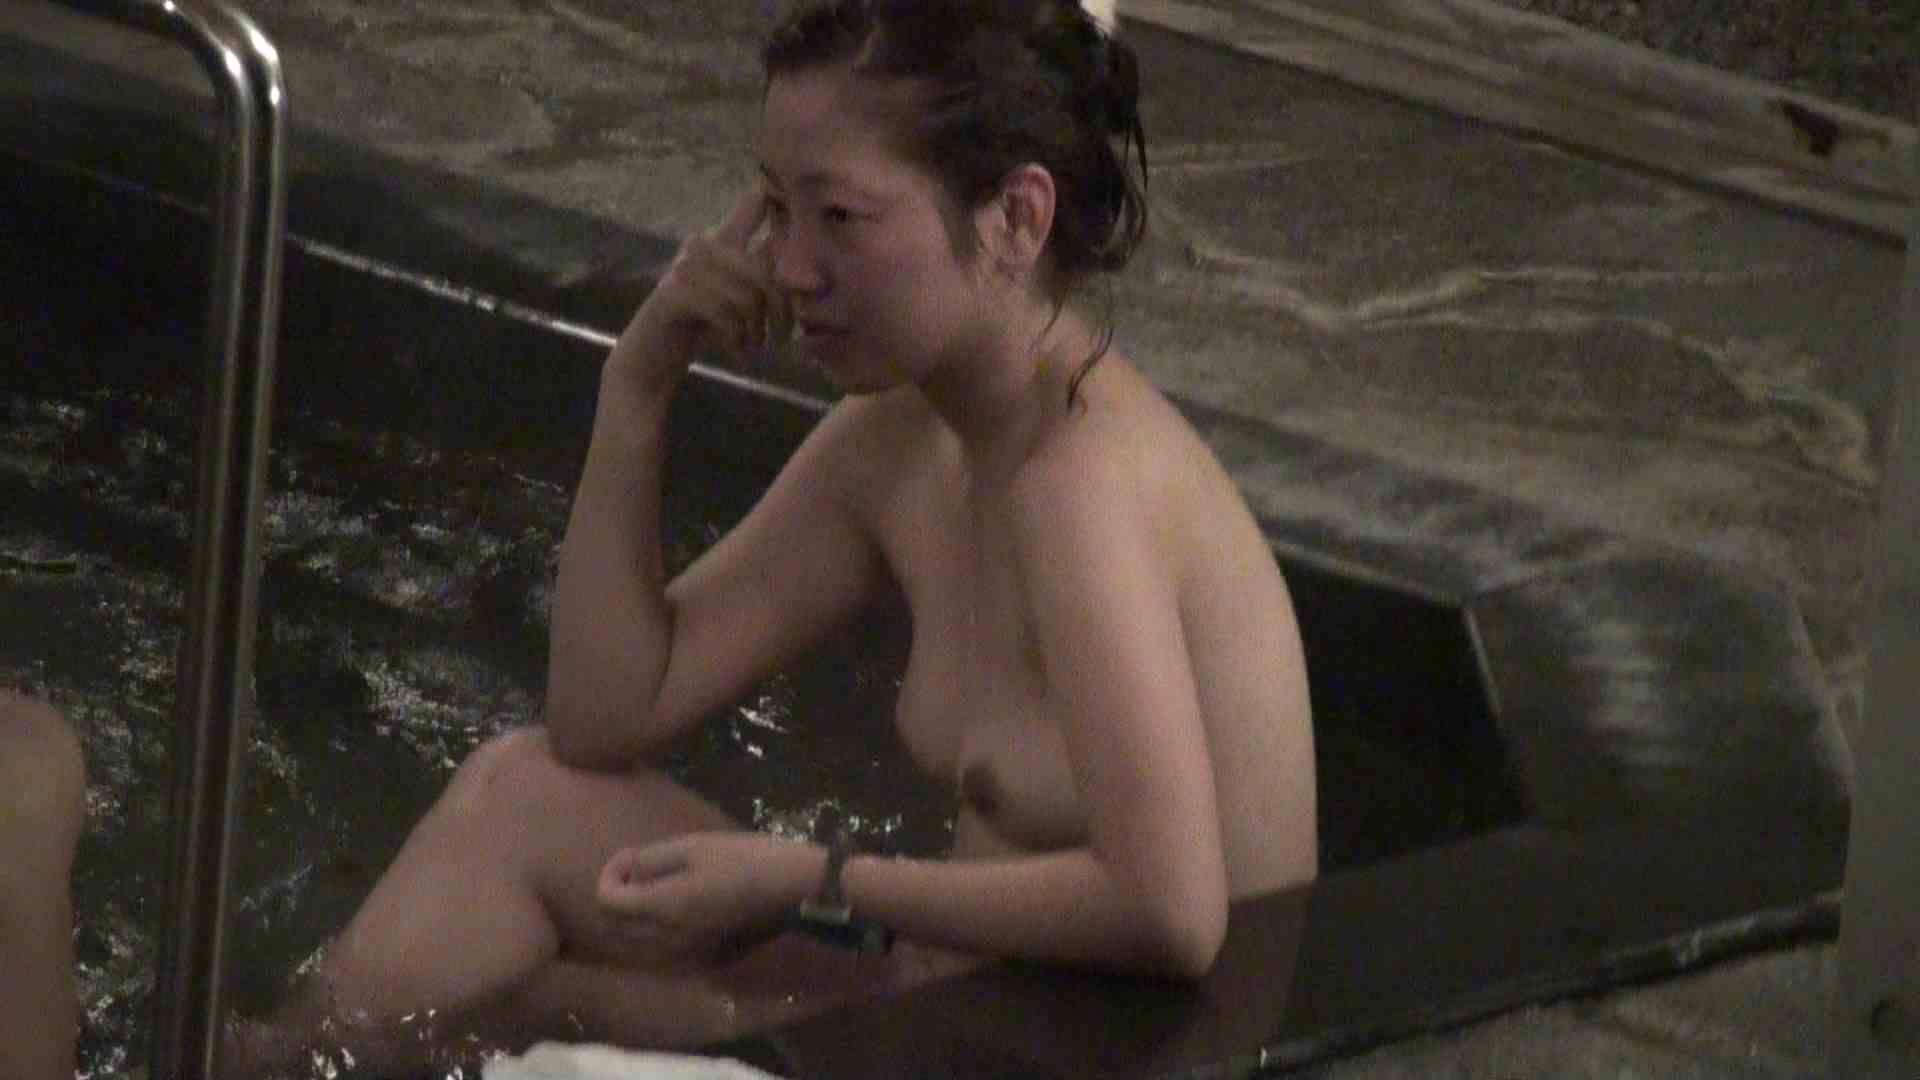 Aquaな露天風呂Vol.422 盗撮映像  61Pix 31